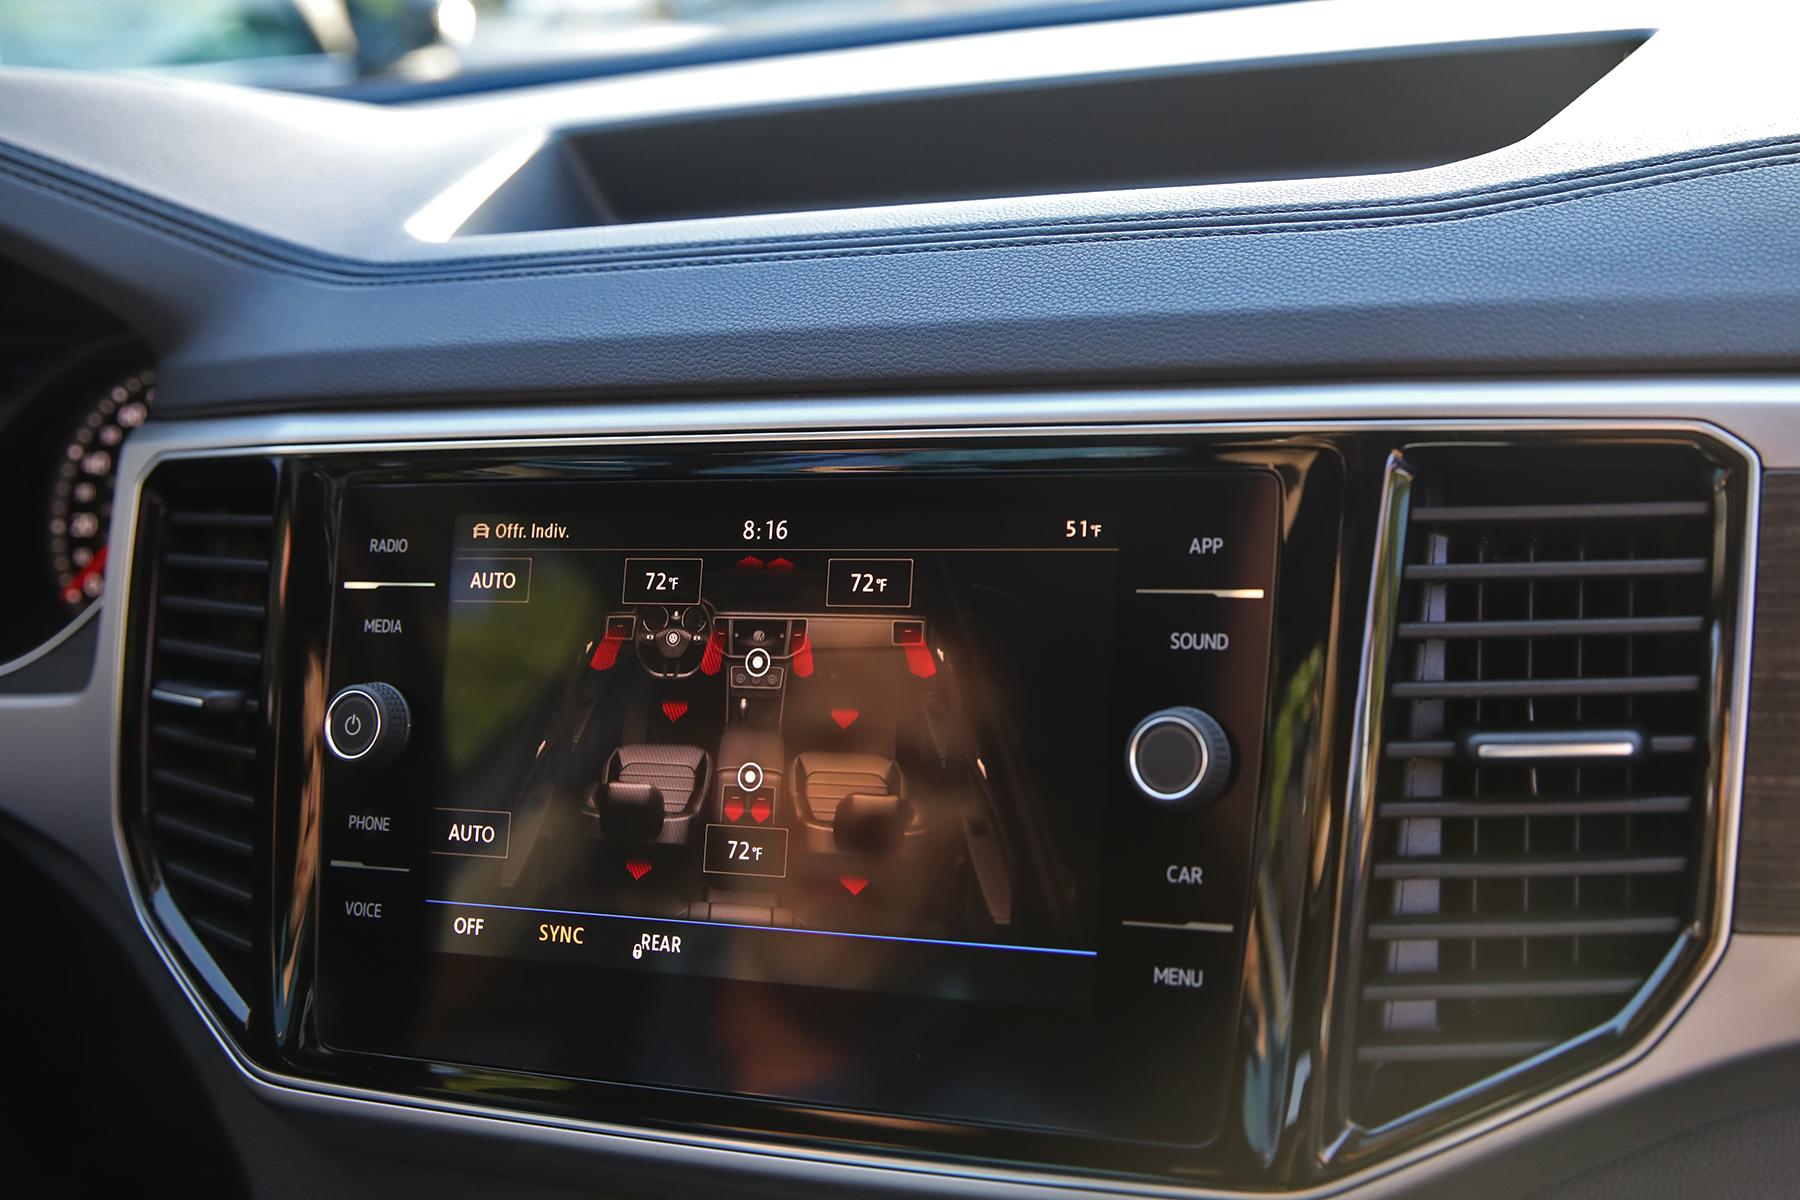 VW Atlas interior SUV climate control screen